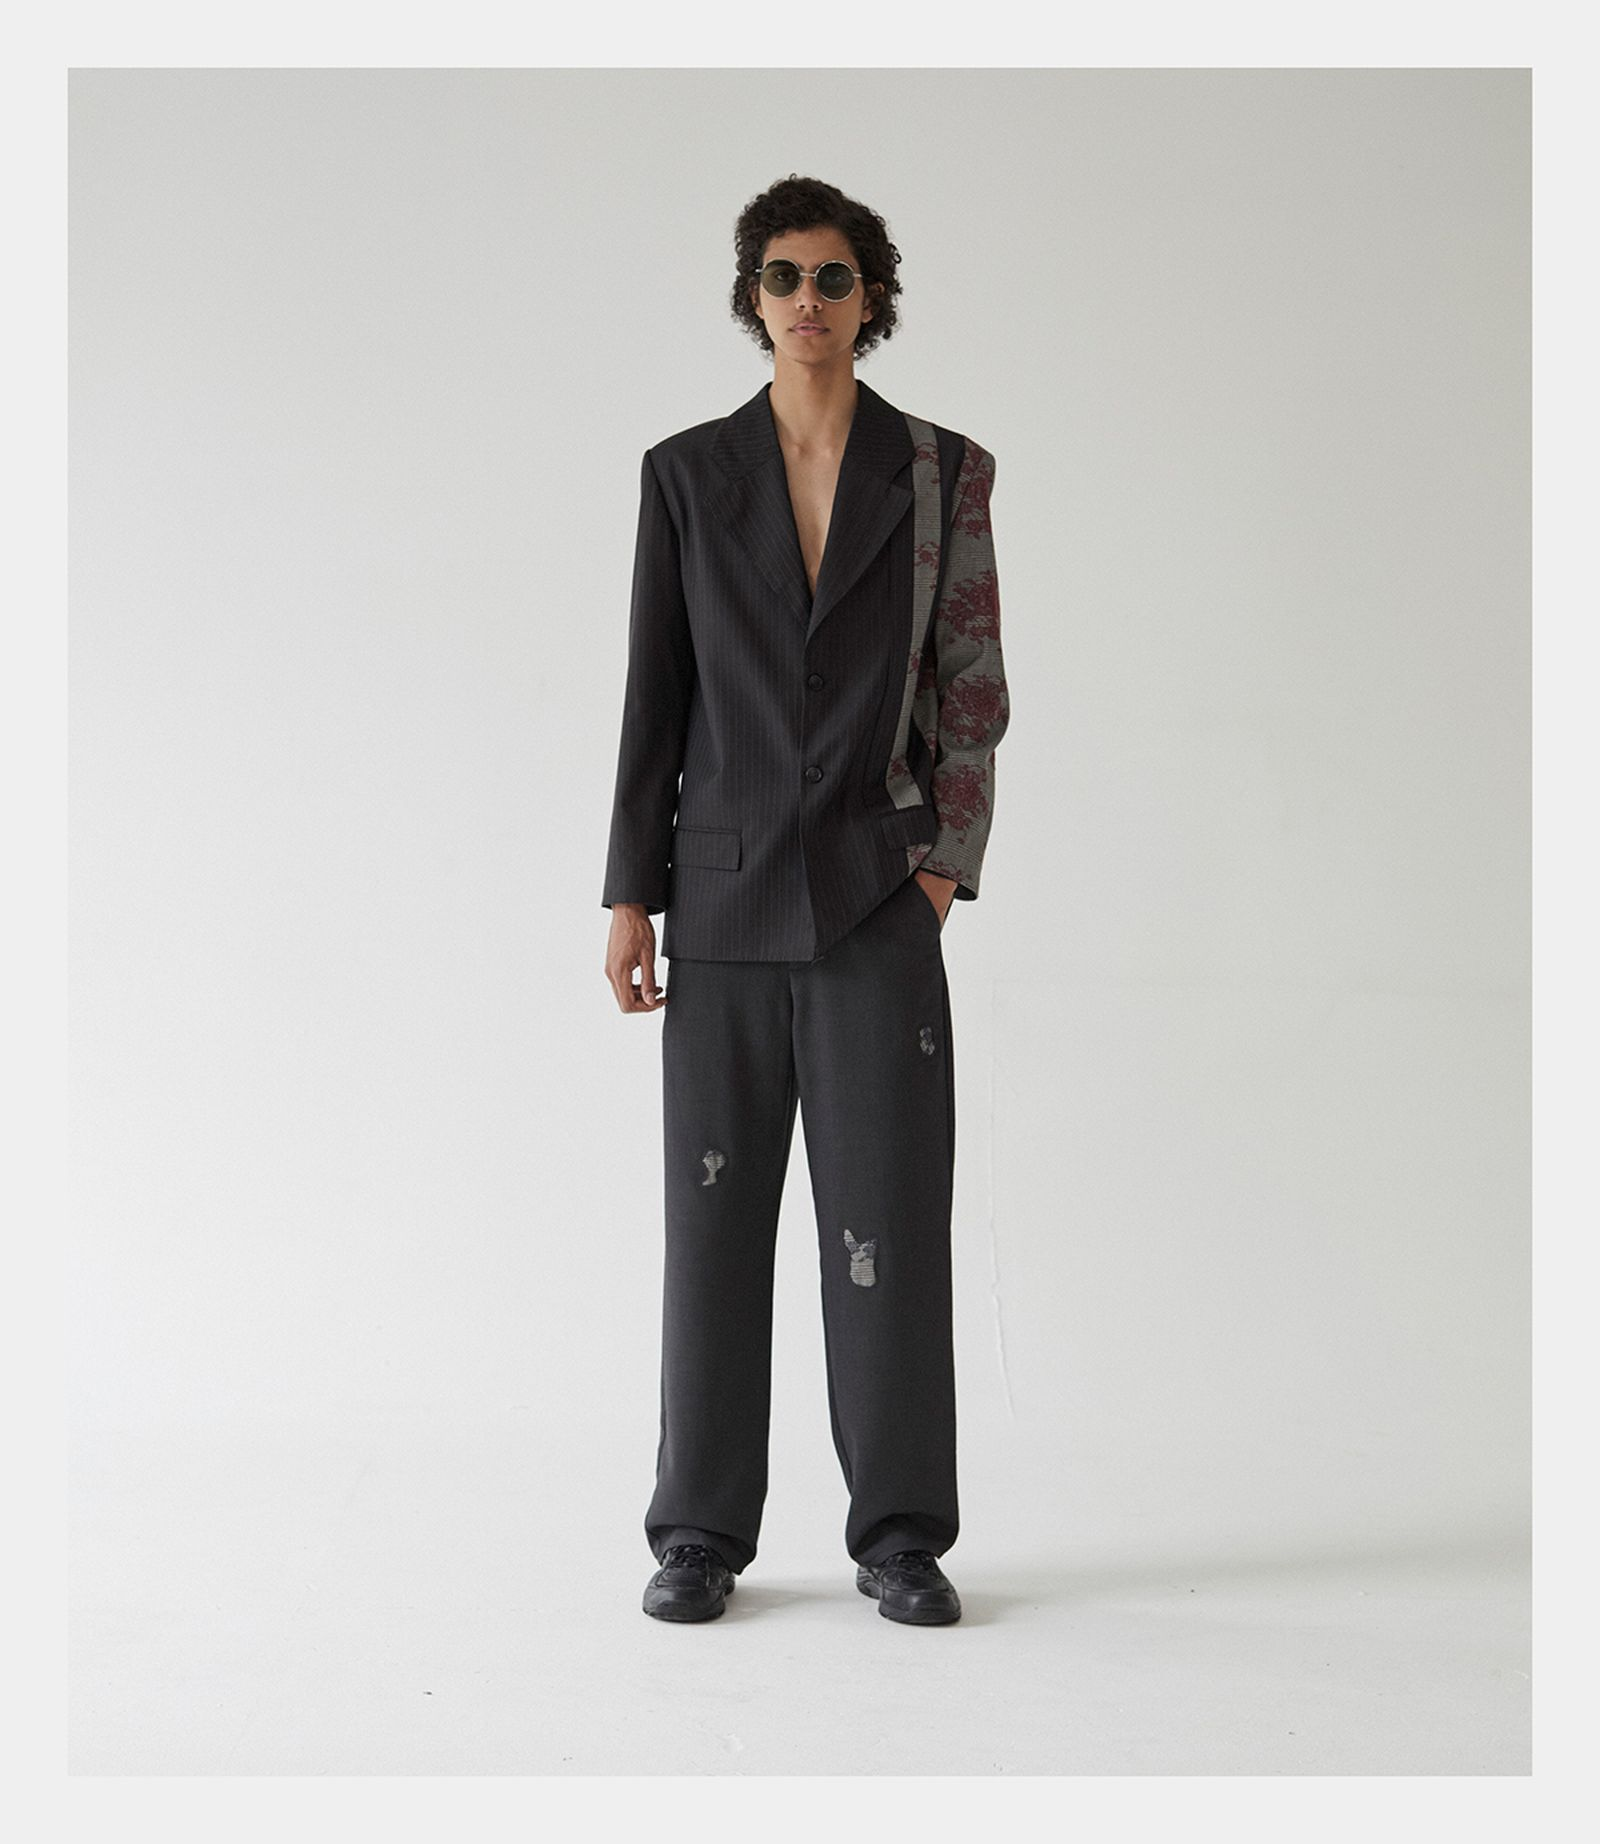 Suit: 3.PARADIS. Sneakers: HI-TEC. Sunglasses: GENTLE MONSTER.